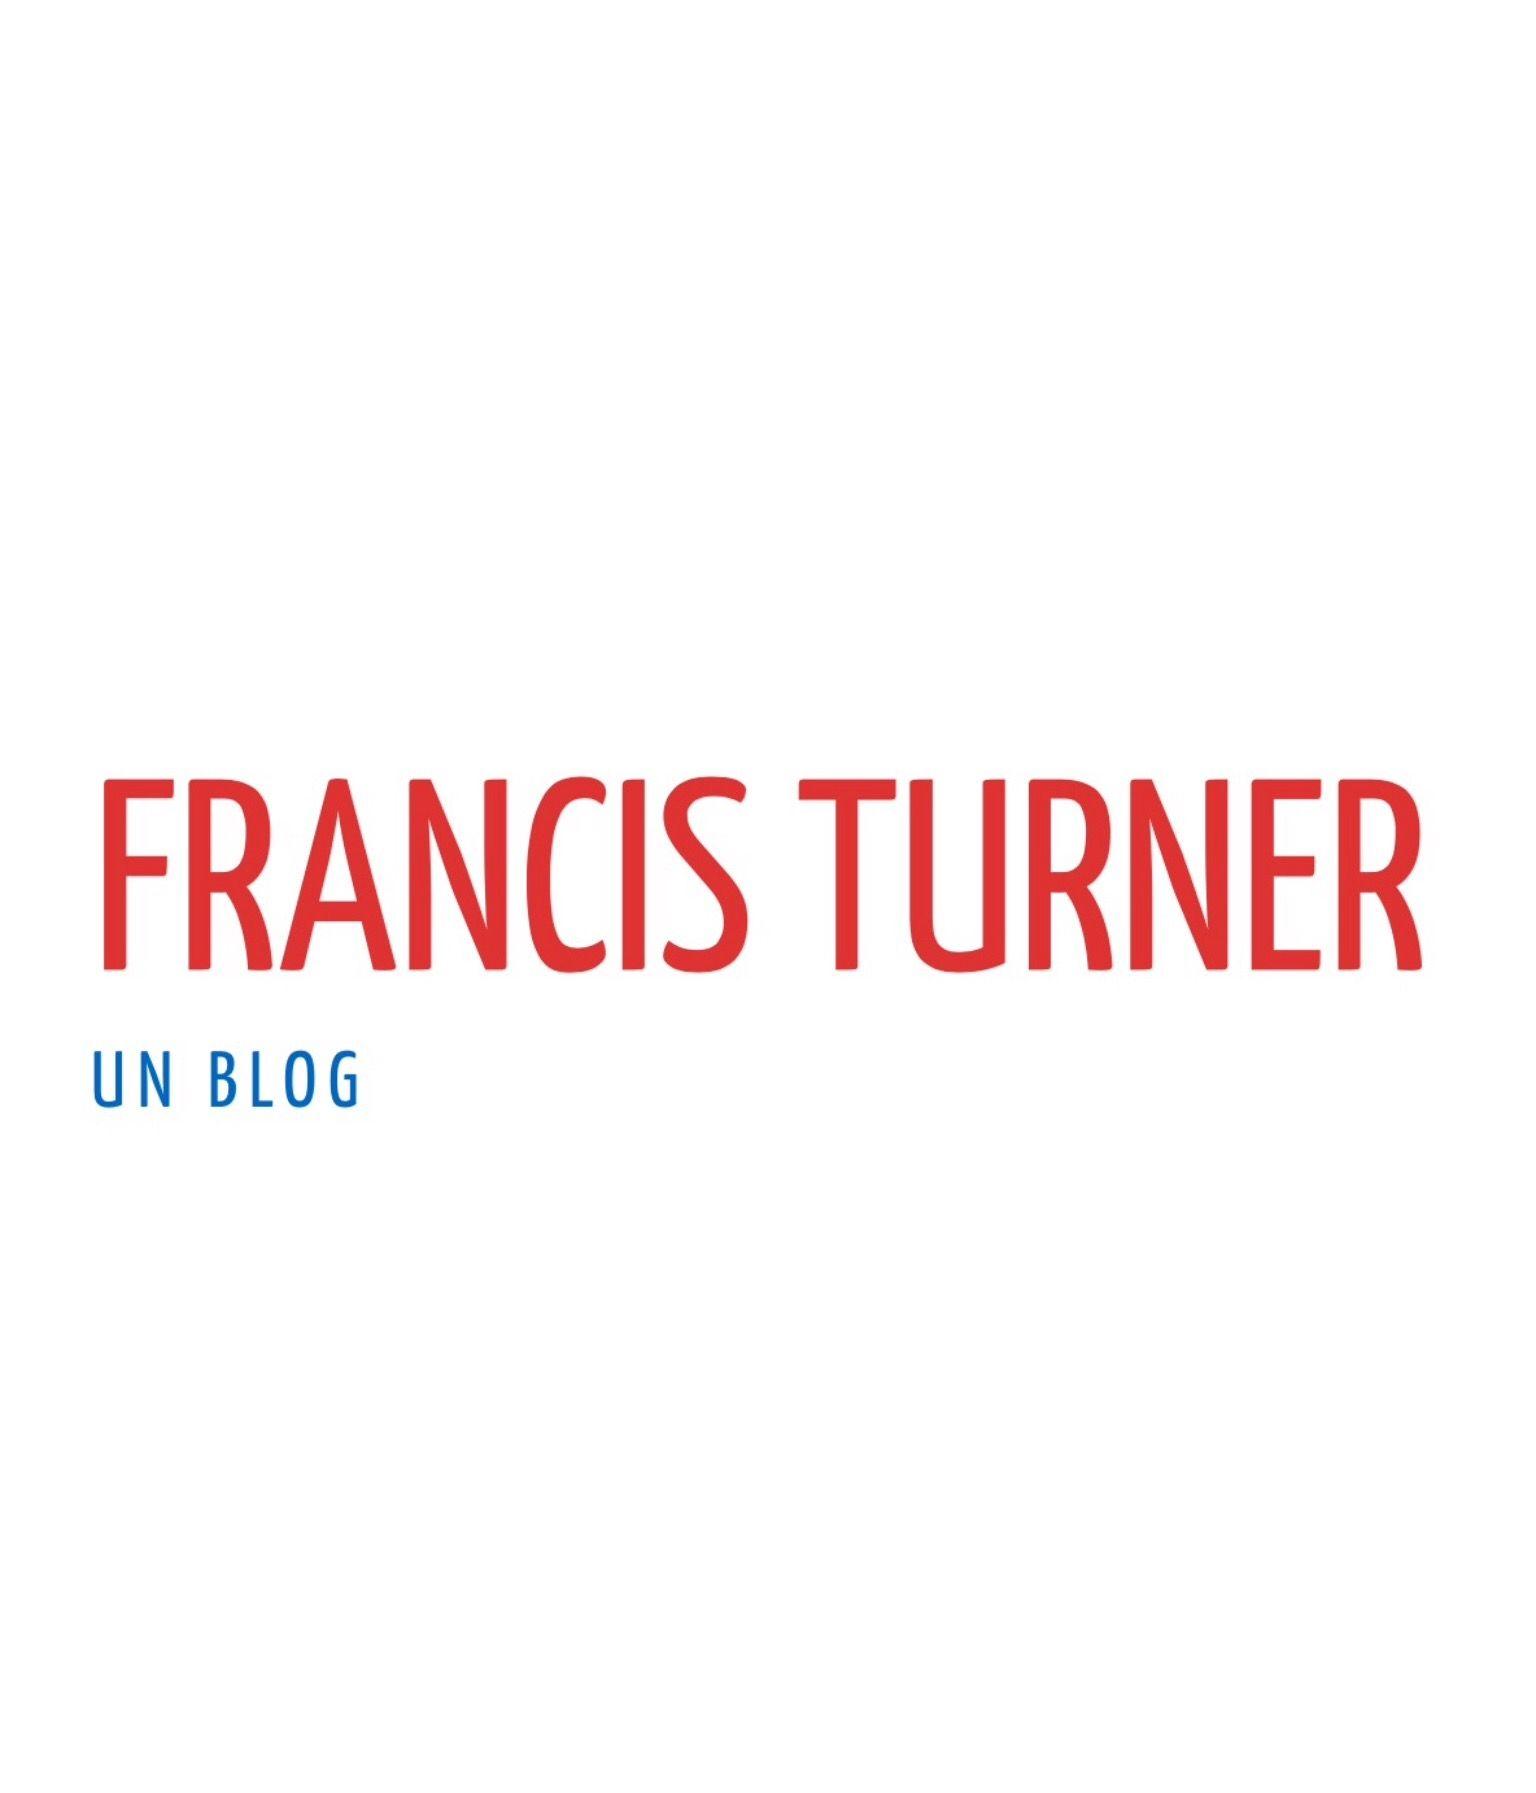 Francis Turner | Un blog